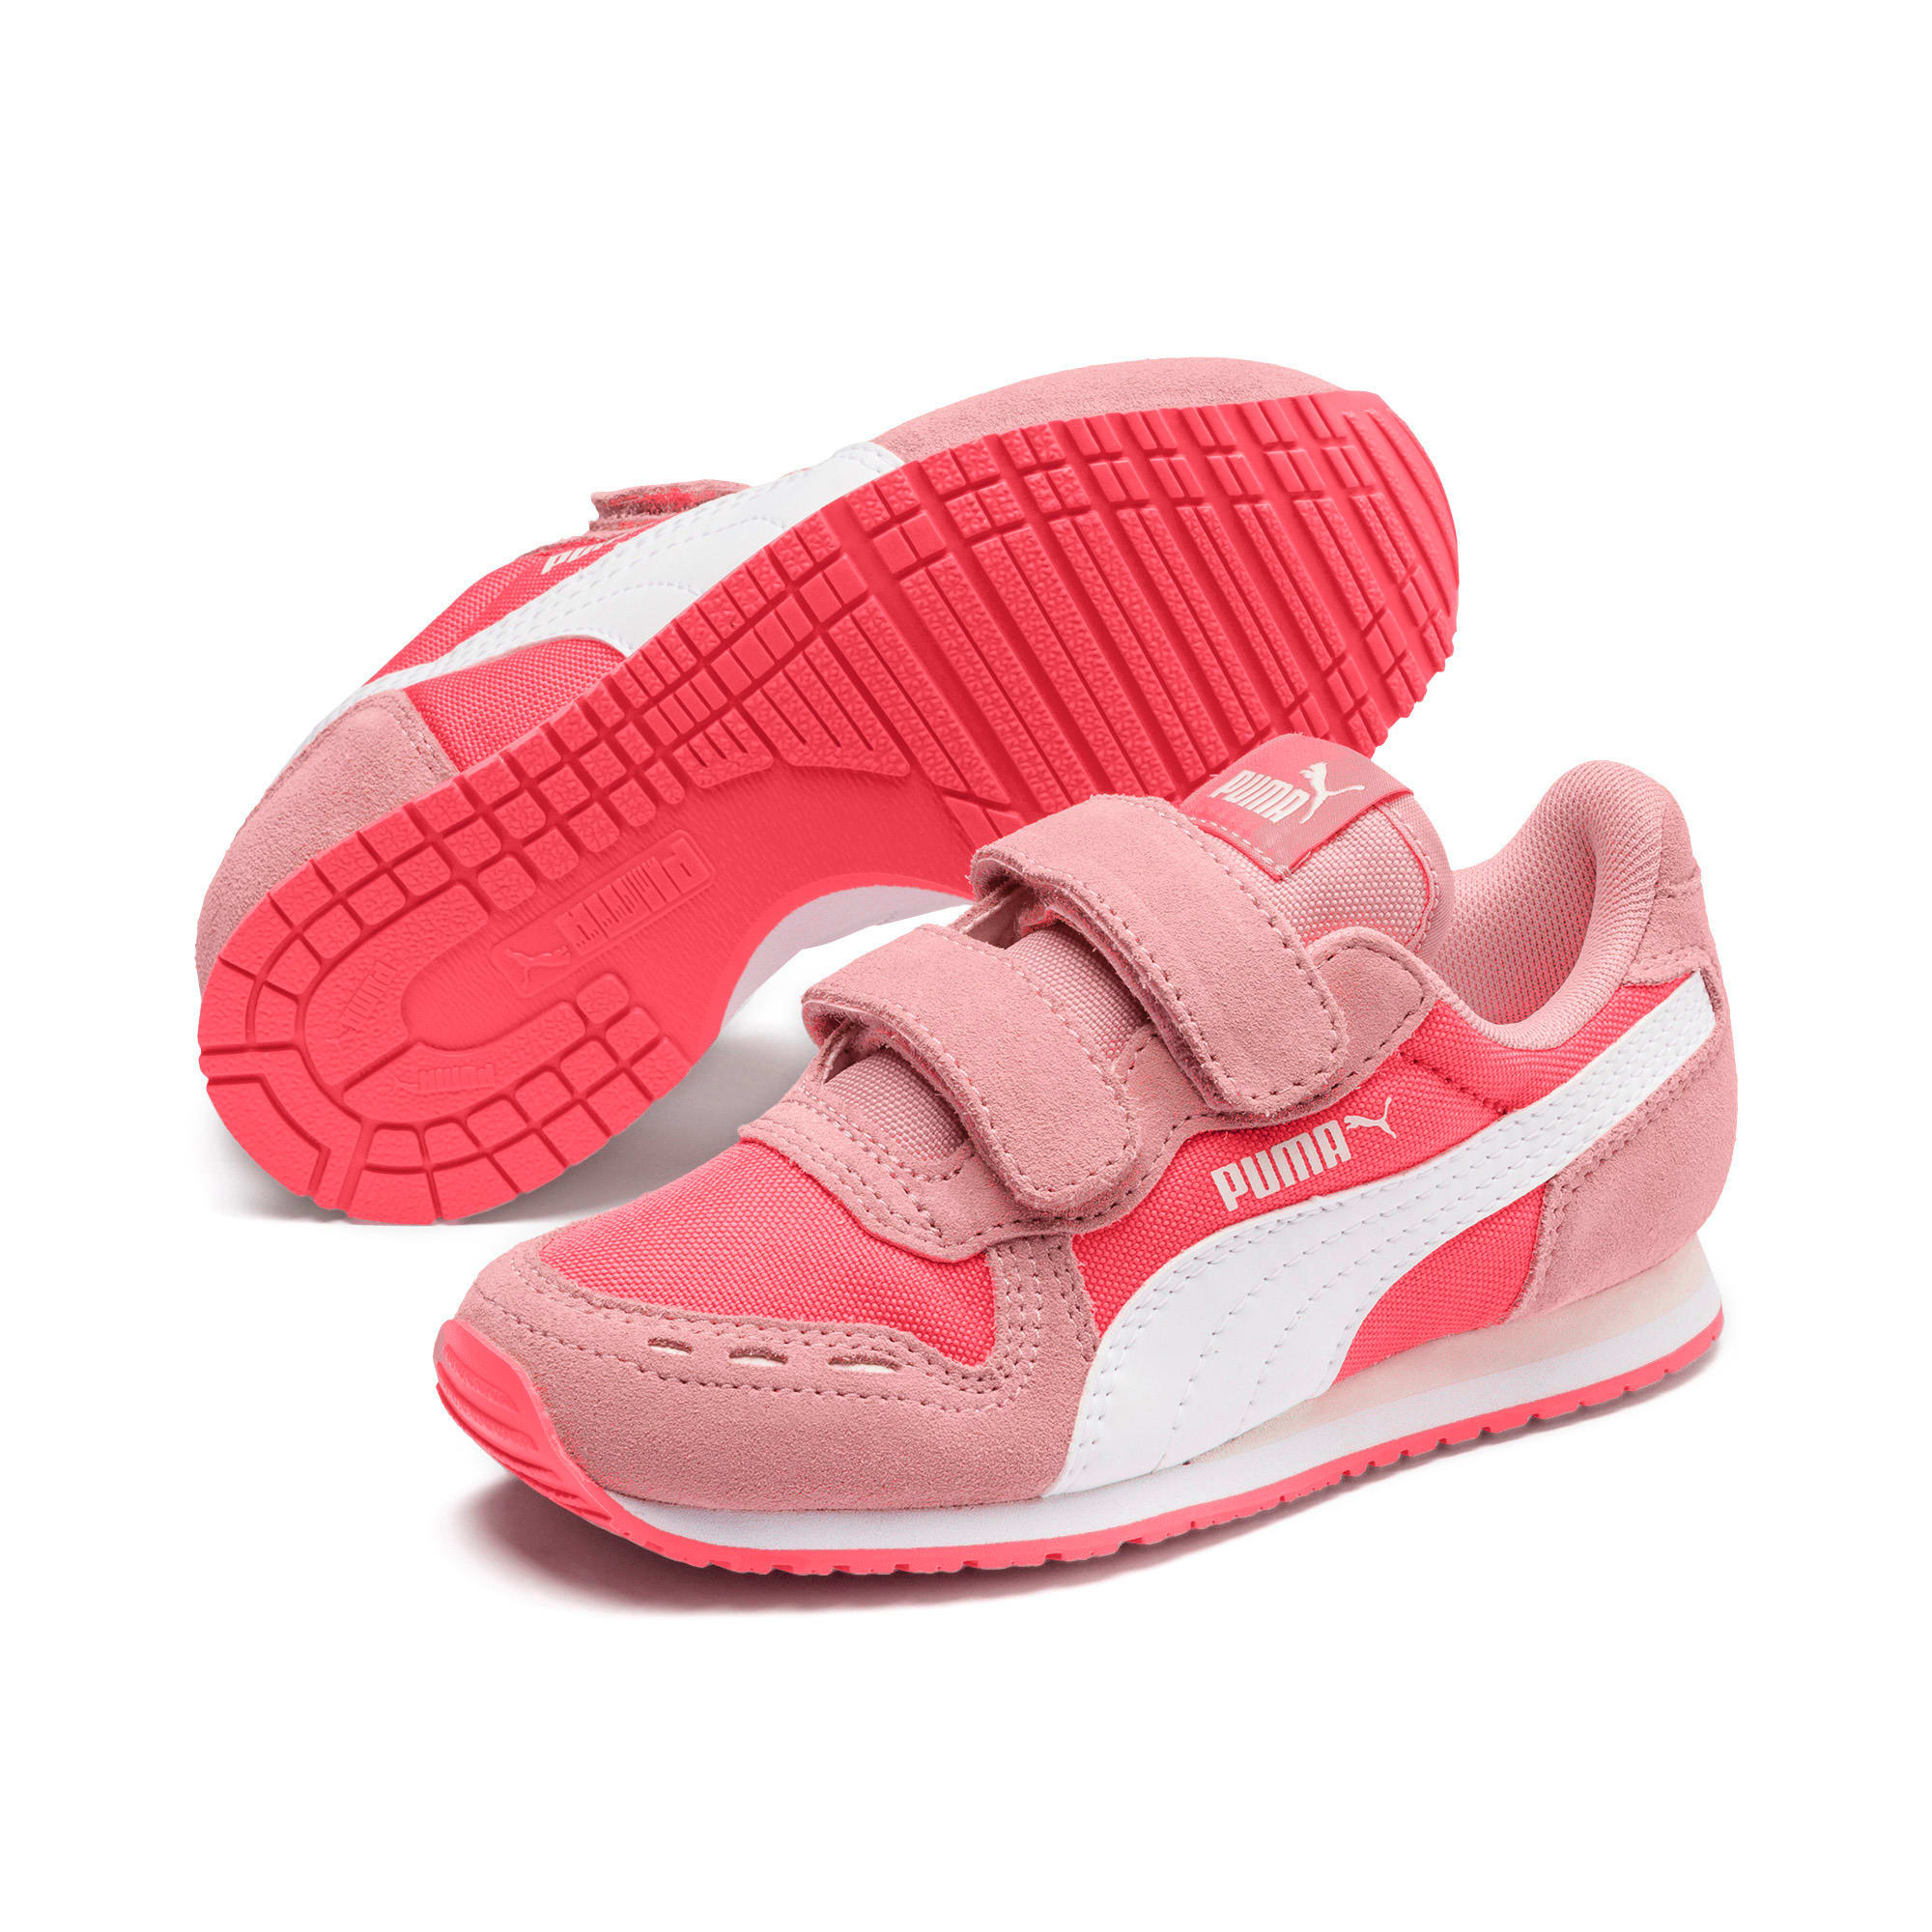 Miniatura 2 de Zapatos Cabana Racer para niño pequeño, Calypso Coral-Bridal Rose, mediano